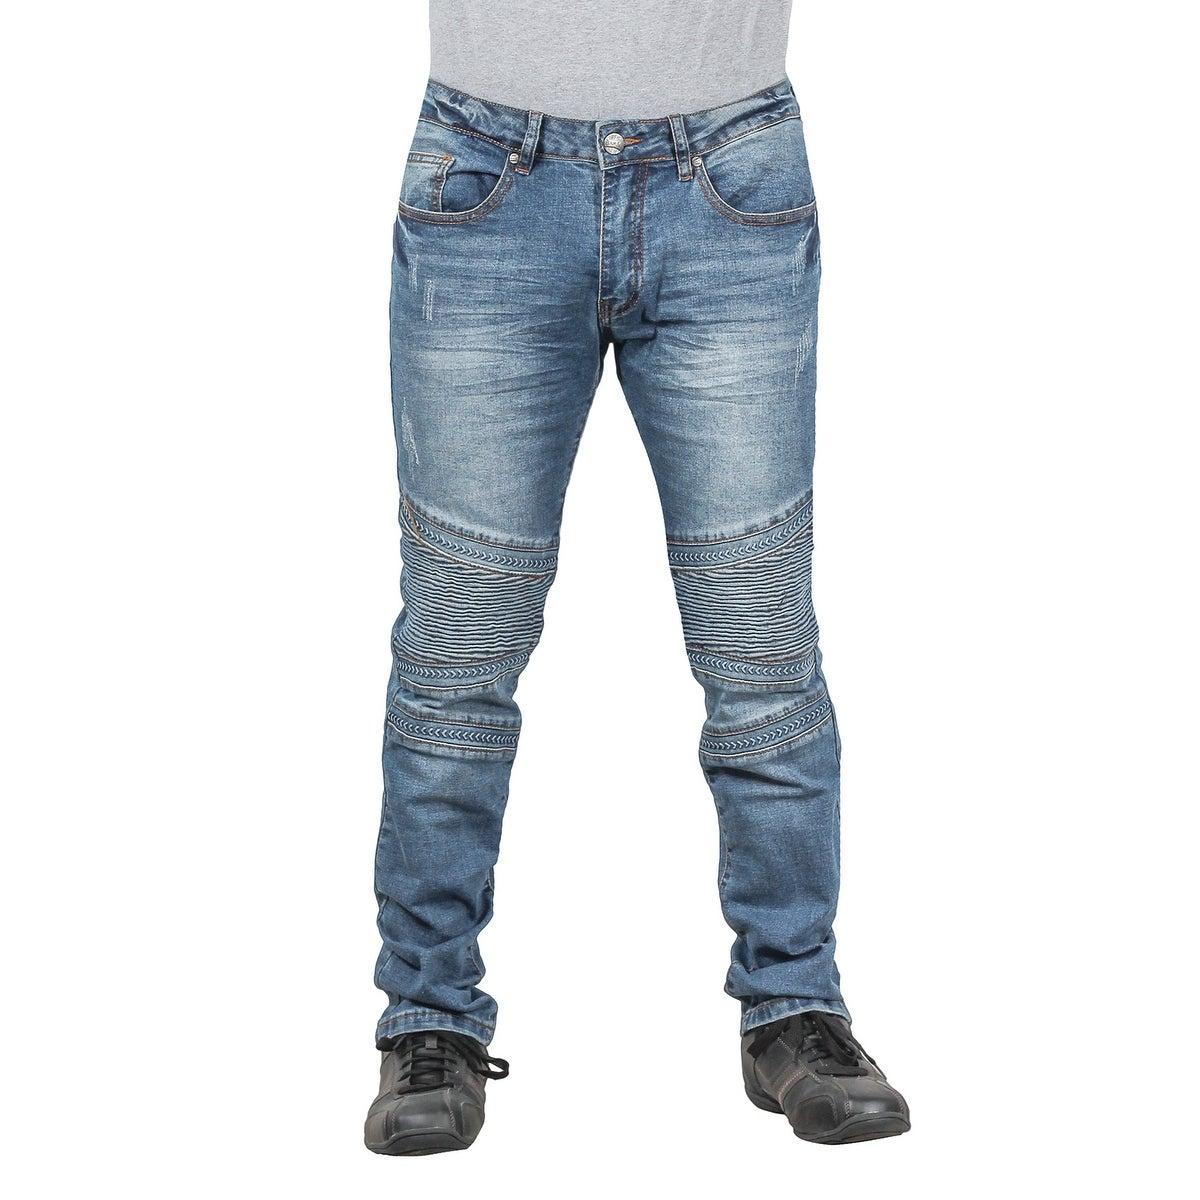 1123a4fa6a Kenneth Cole Reaction Mens Slim Fit Stretch Gabardine Dress Pants ...